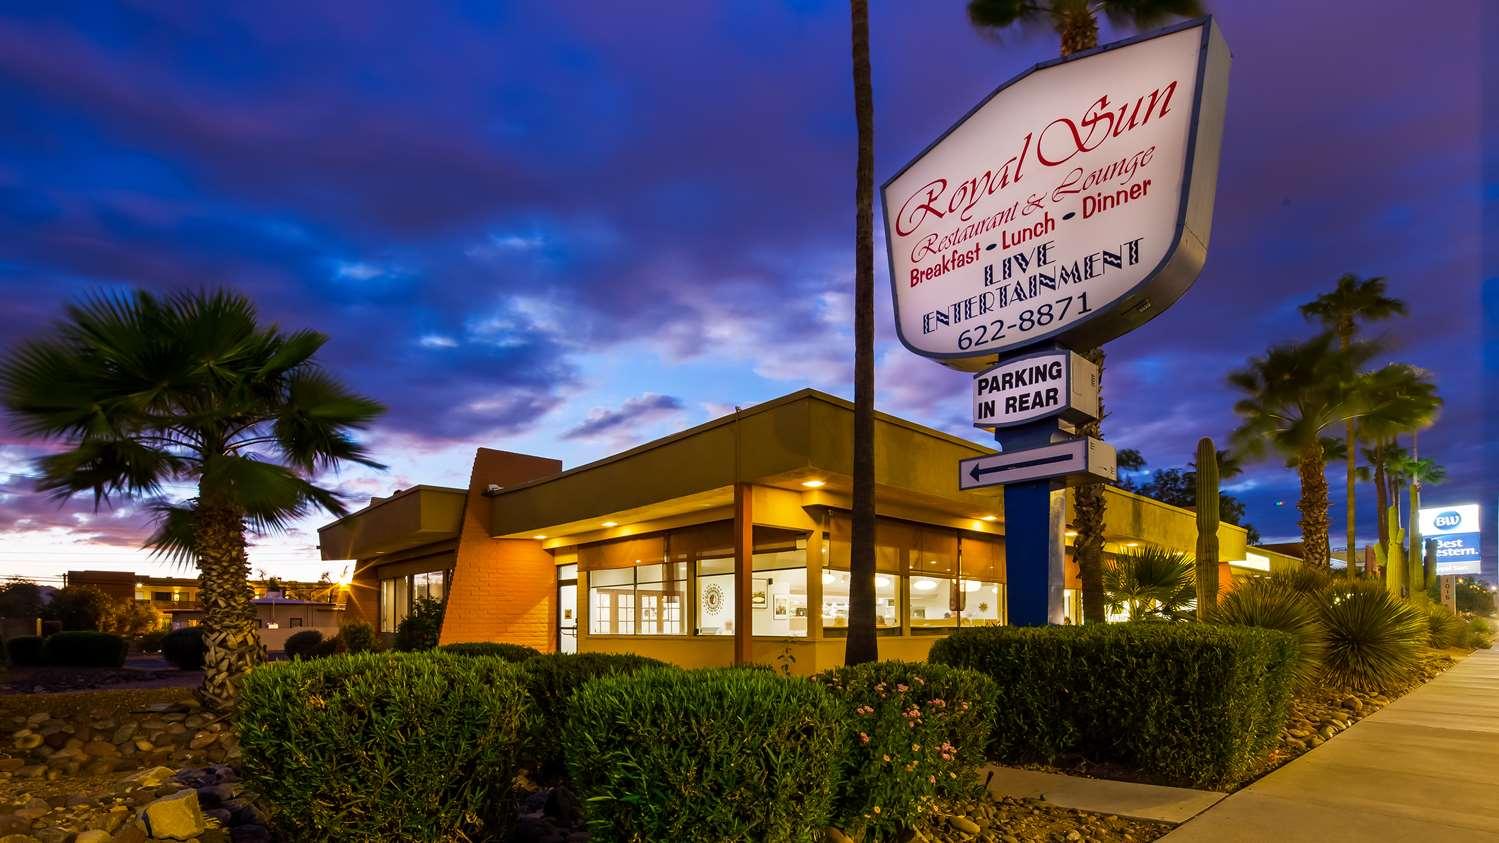 Exterior view - Best Western Royal Sun Inn & Suites Tucson